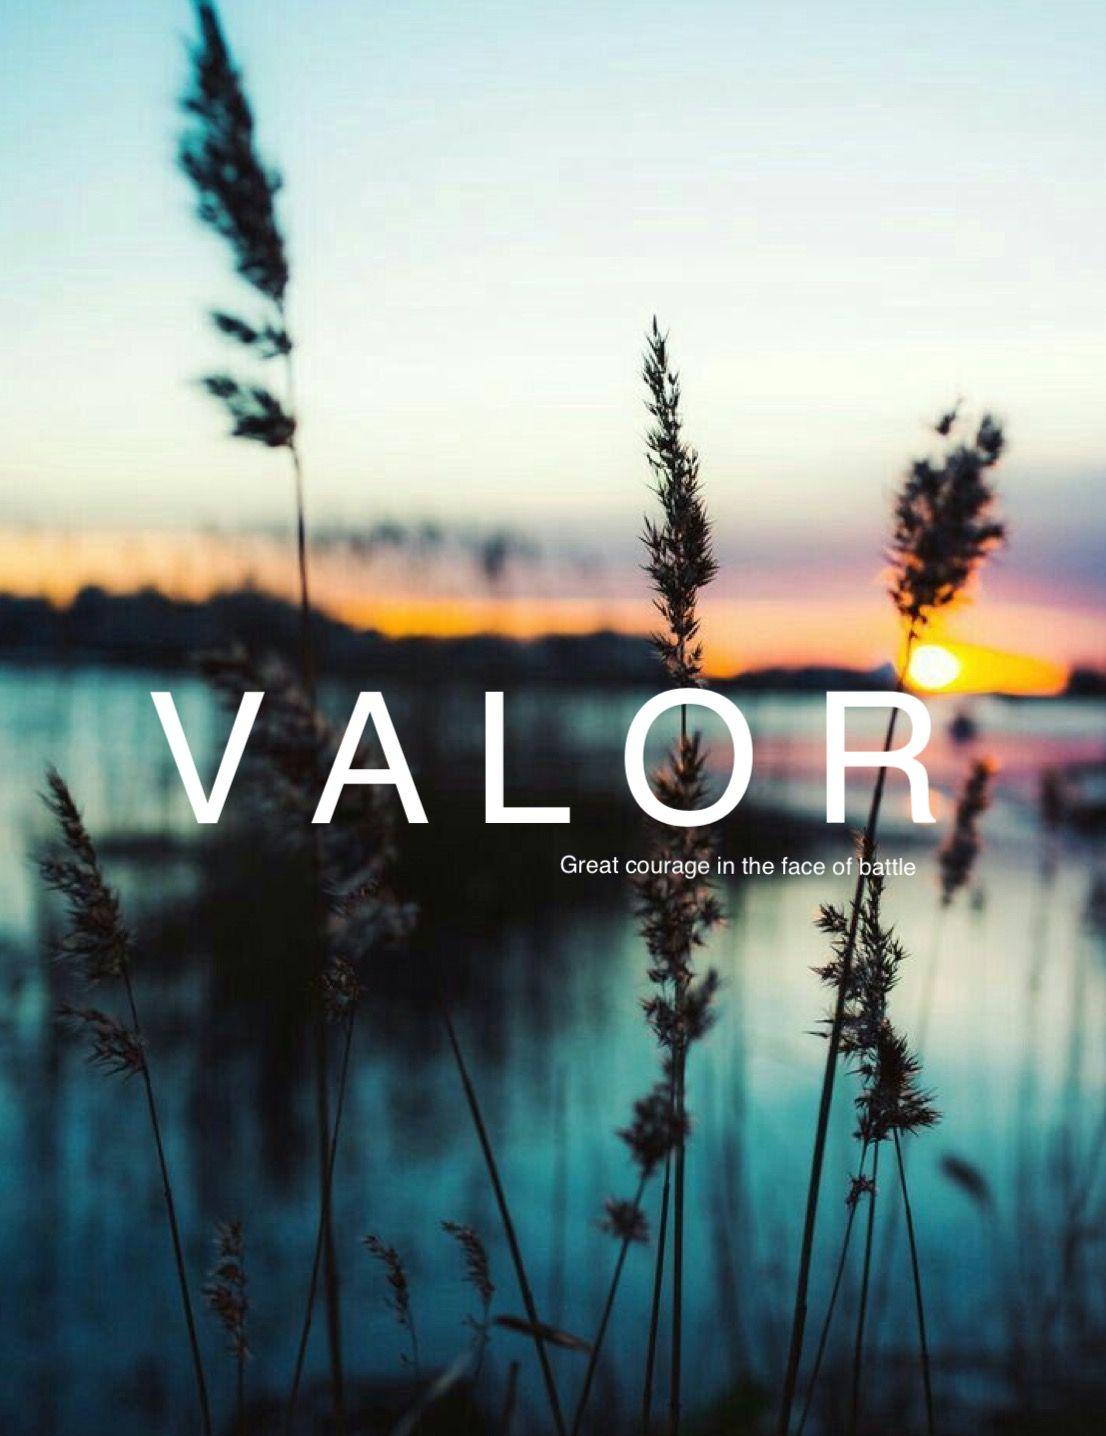 Valor Baby Names Strong Male Names Boy Names Men Names Unique Biblical Names Landscape Photography Nature Photography